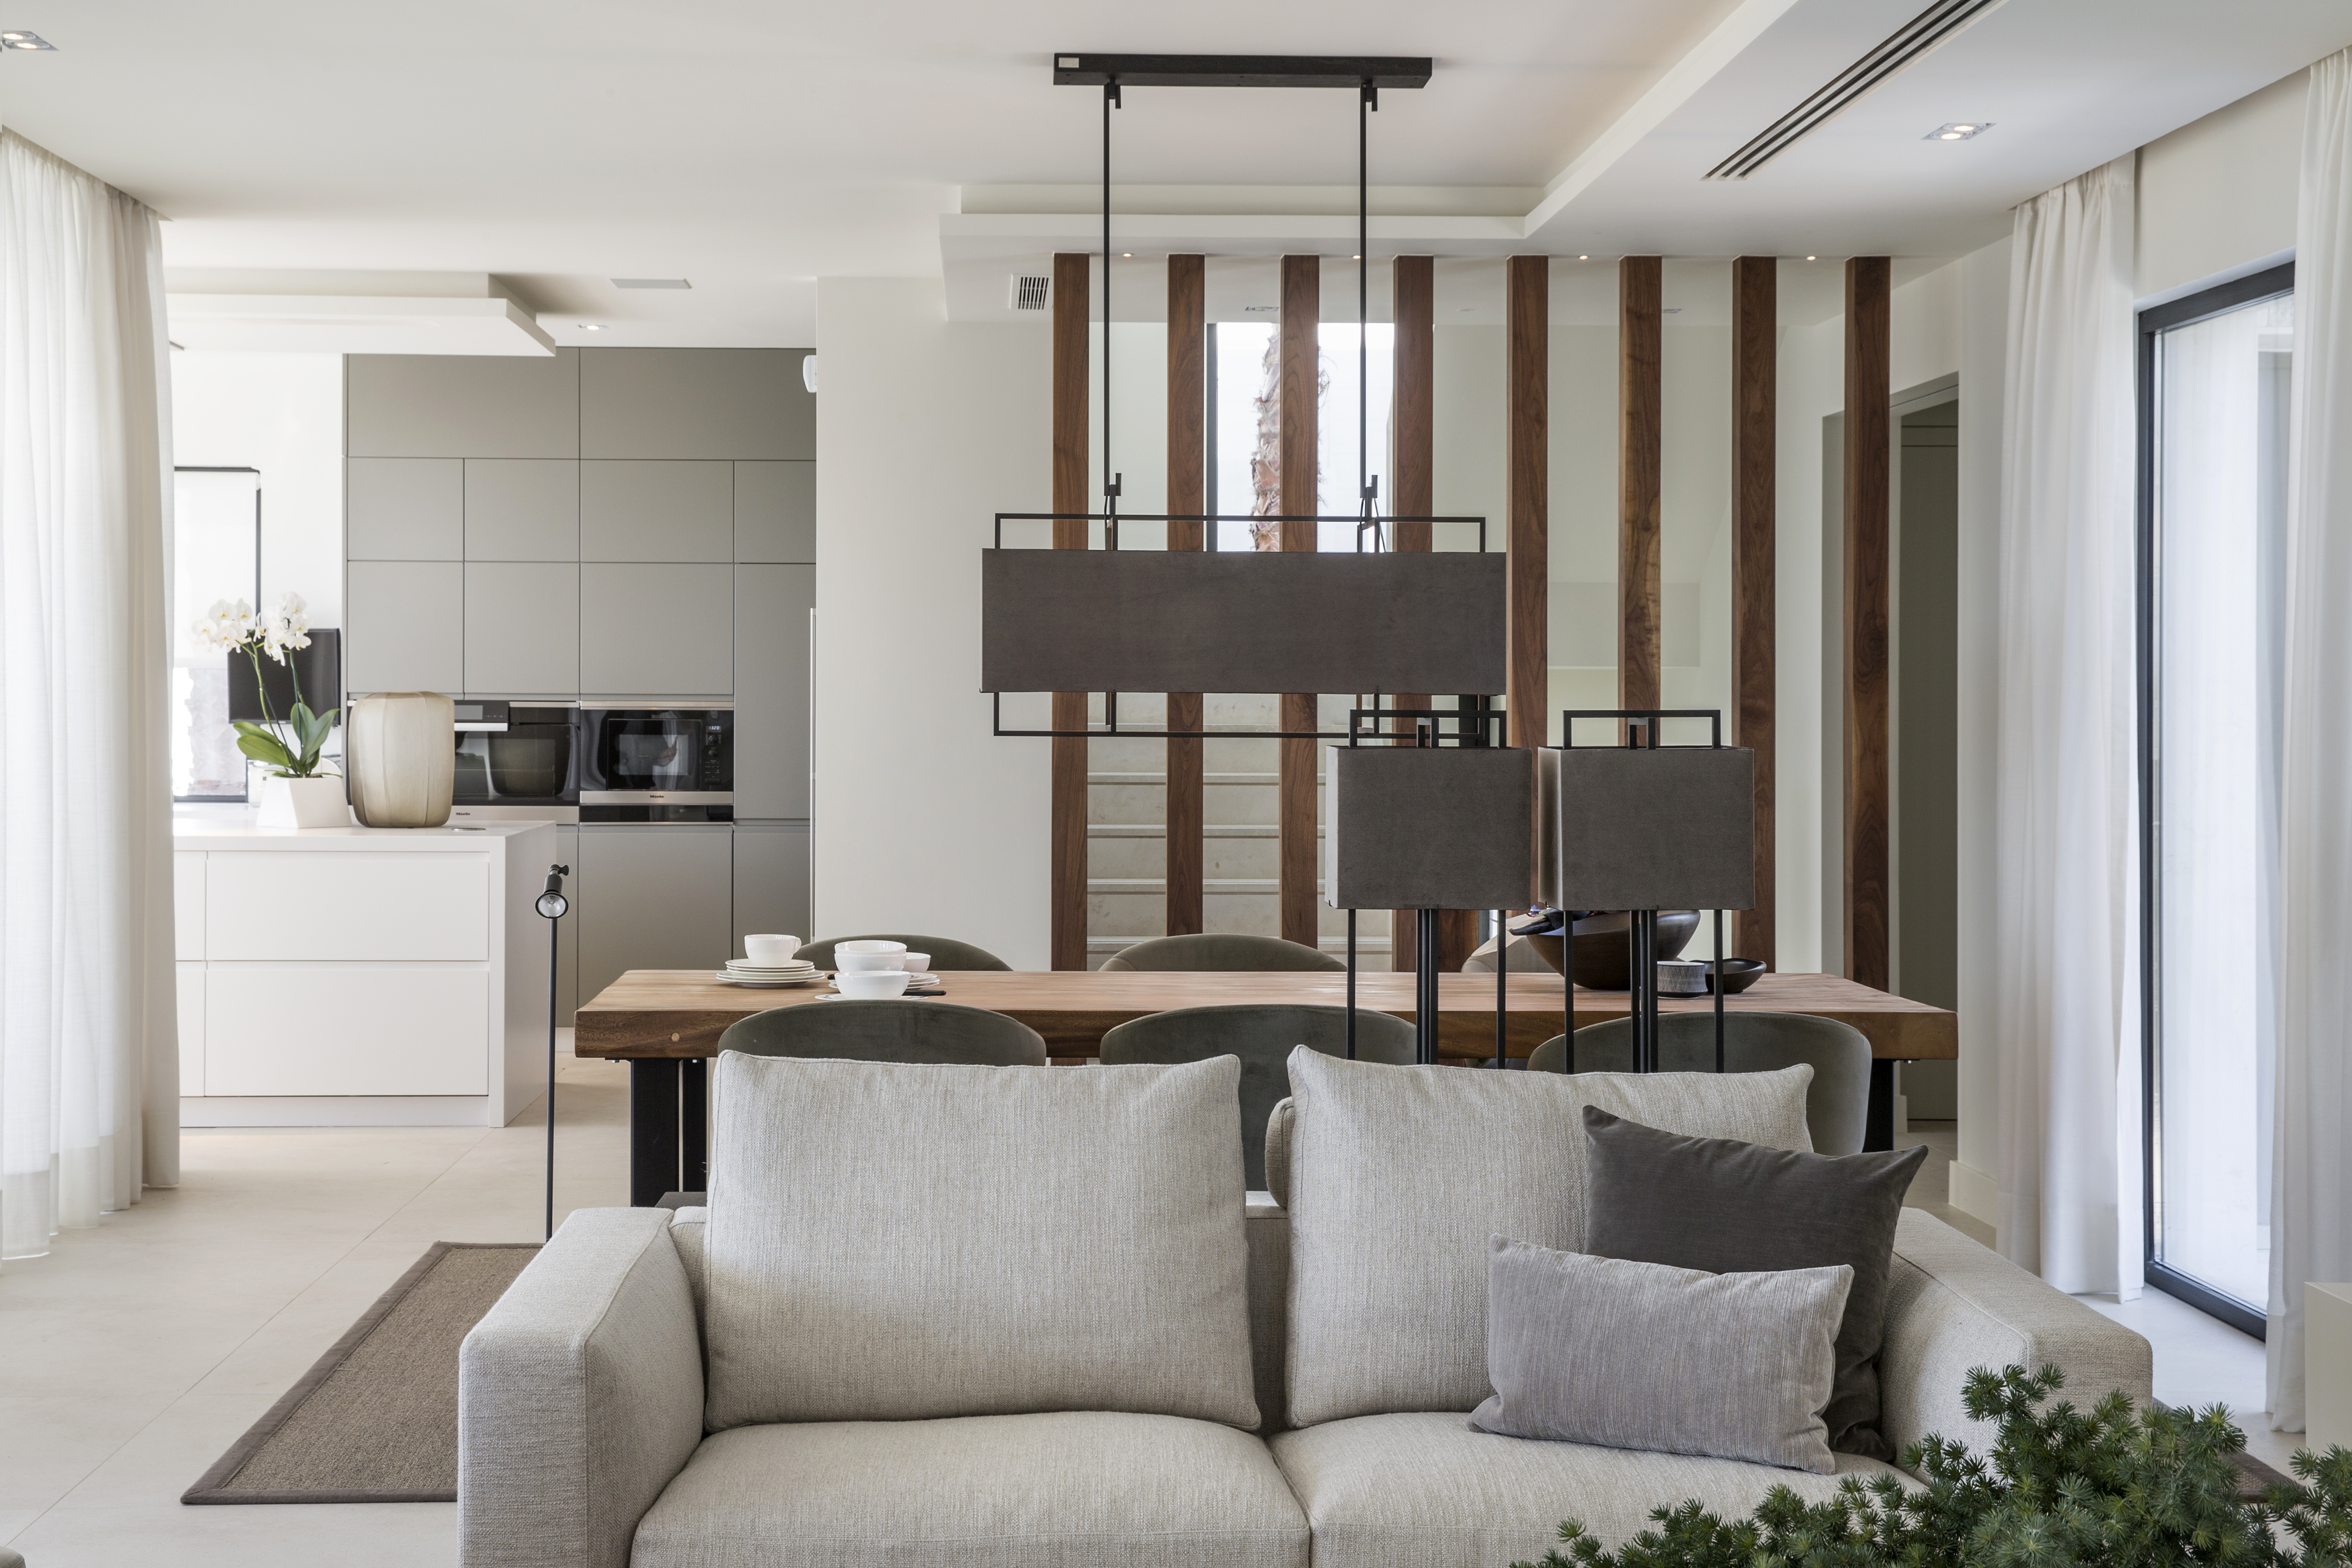 New villa marbella raw interiors